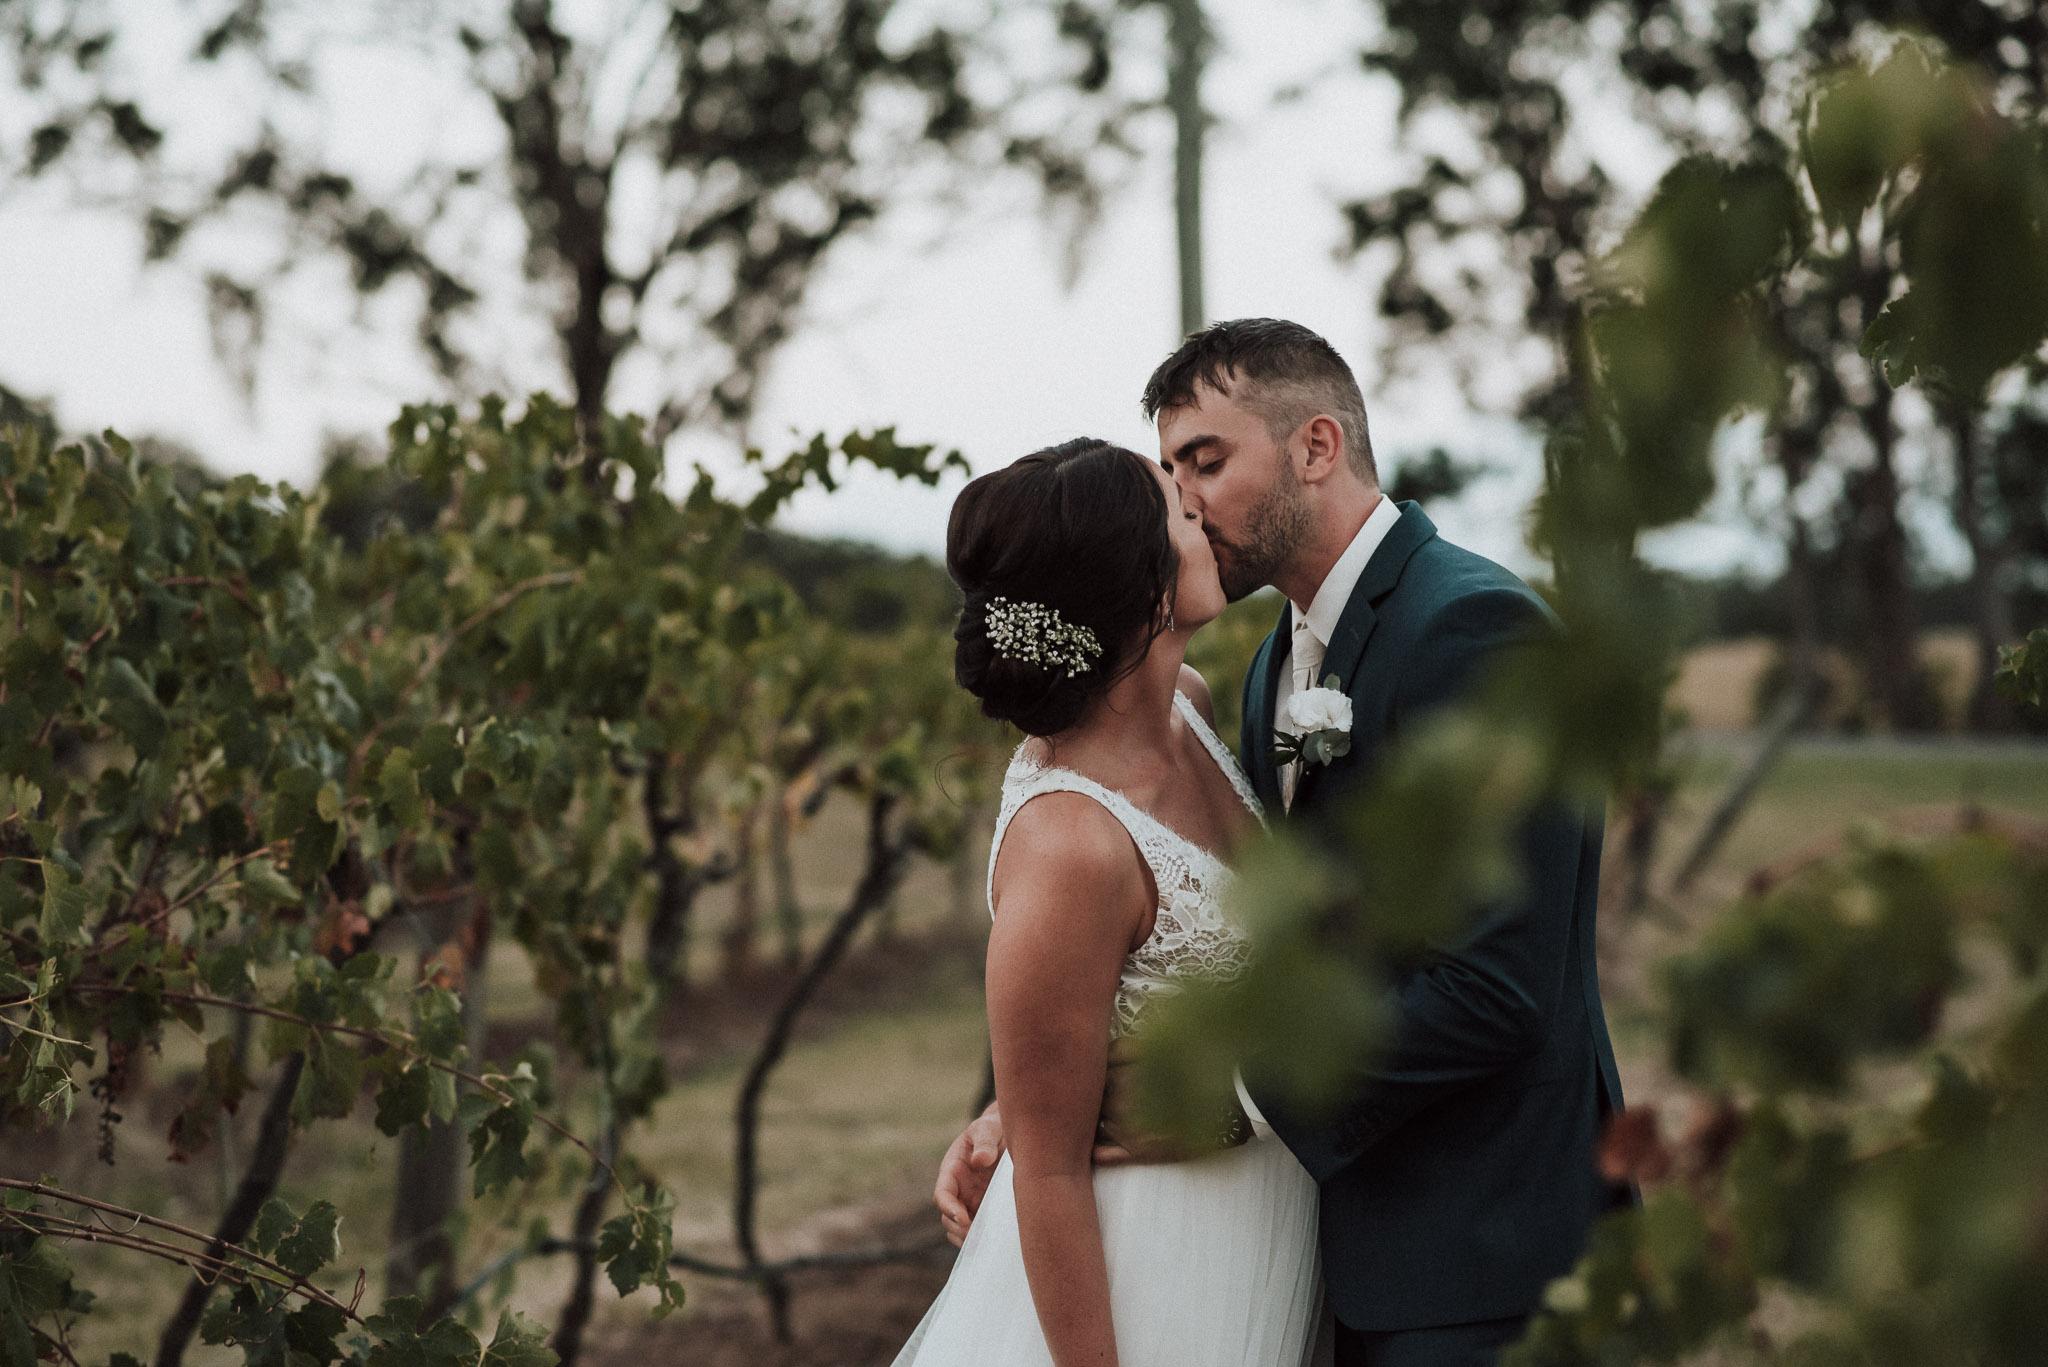 MECURE-RESORT-WEDDING-KING-WEB-533.jpg